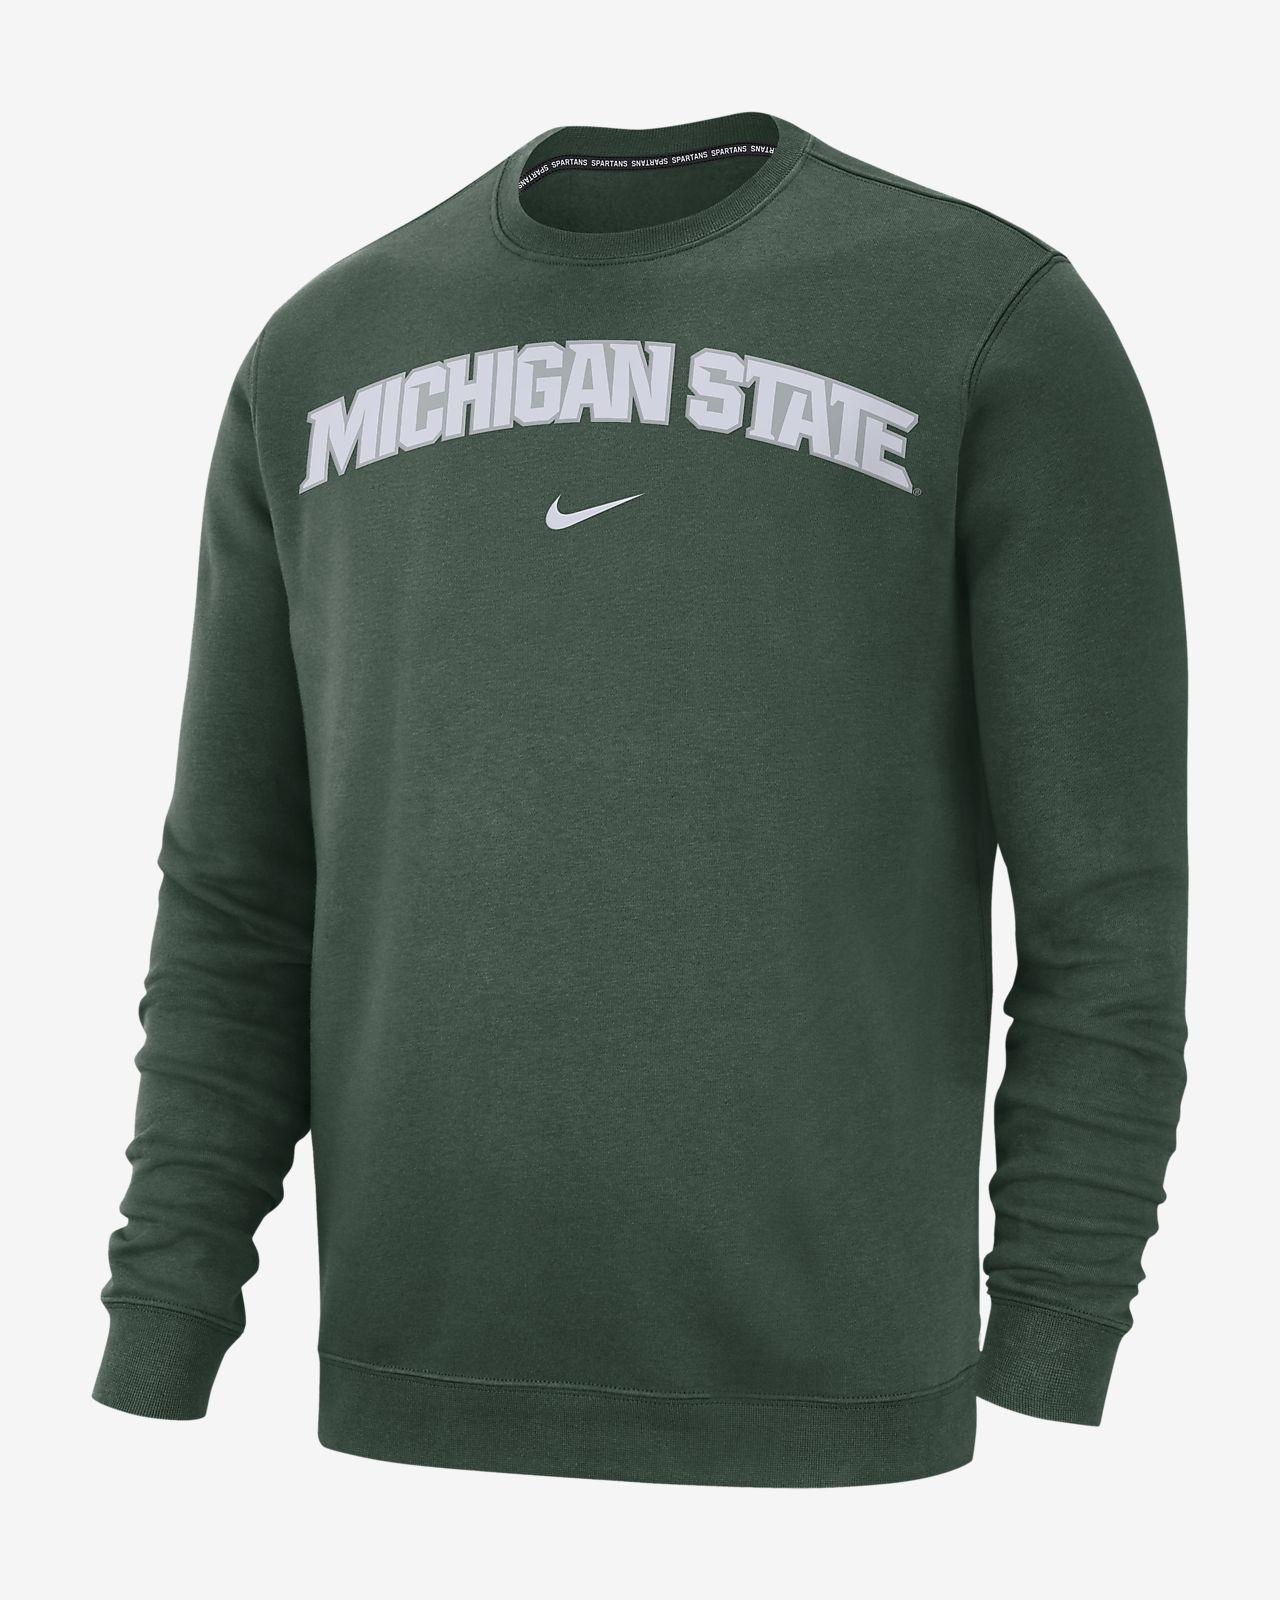 Nike College Club Michigan State Men S Sweatshirt Nike Com